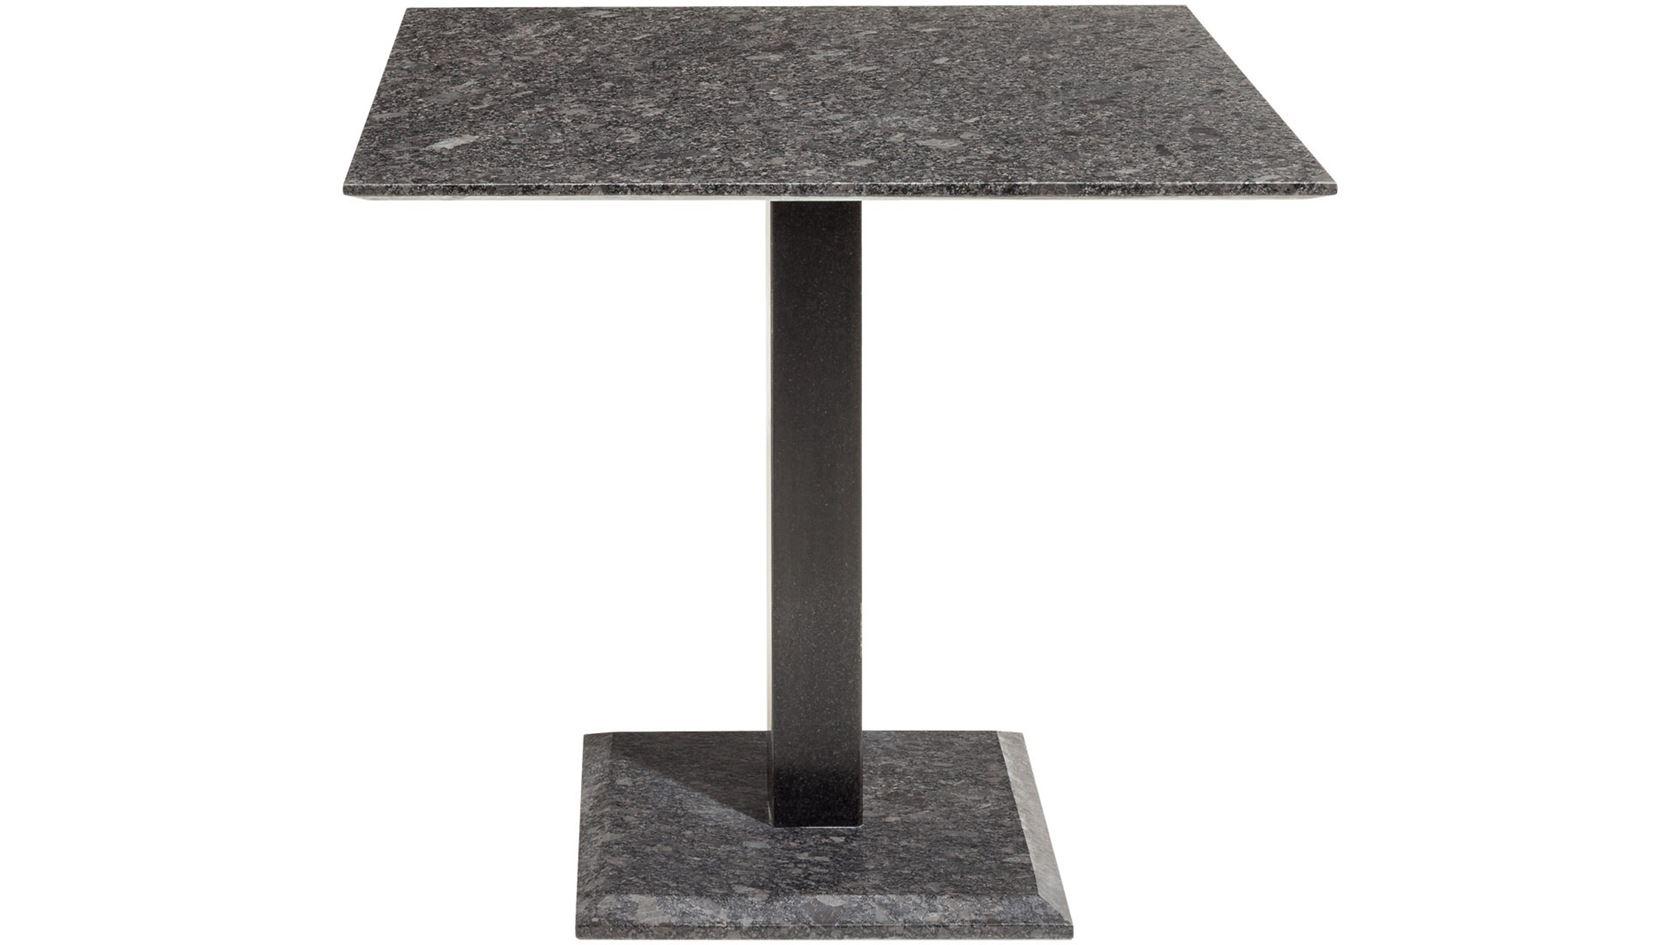 tafel edam, pearl grey satinado, poot 8 x 8cm rvs